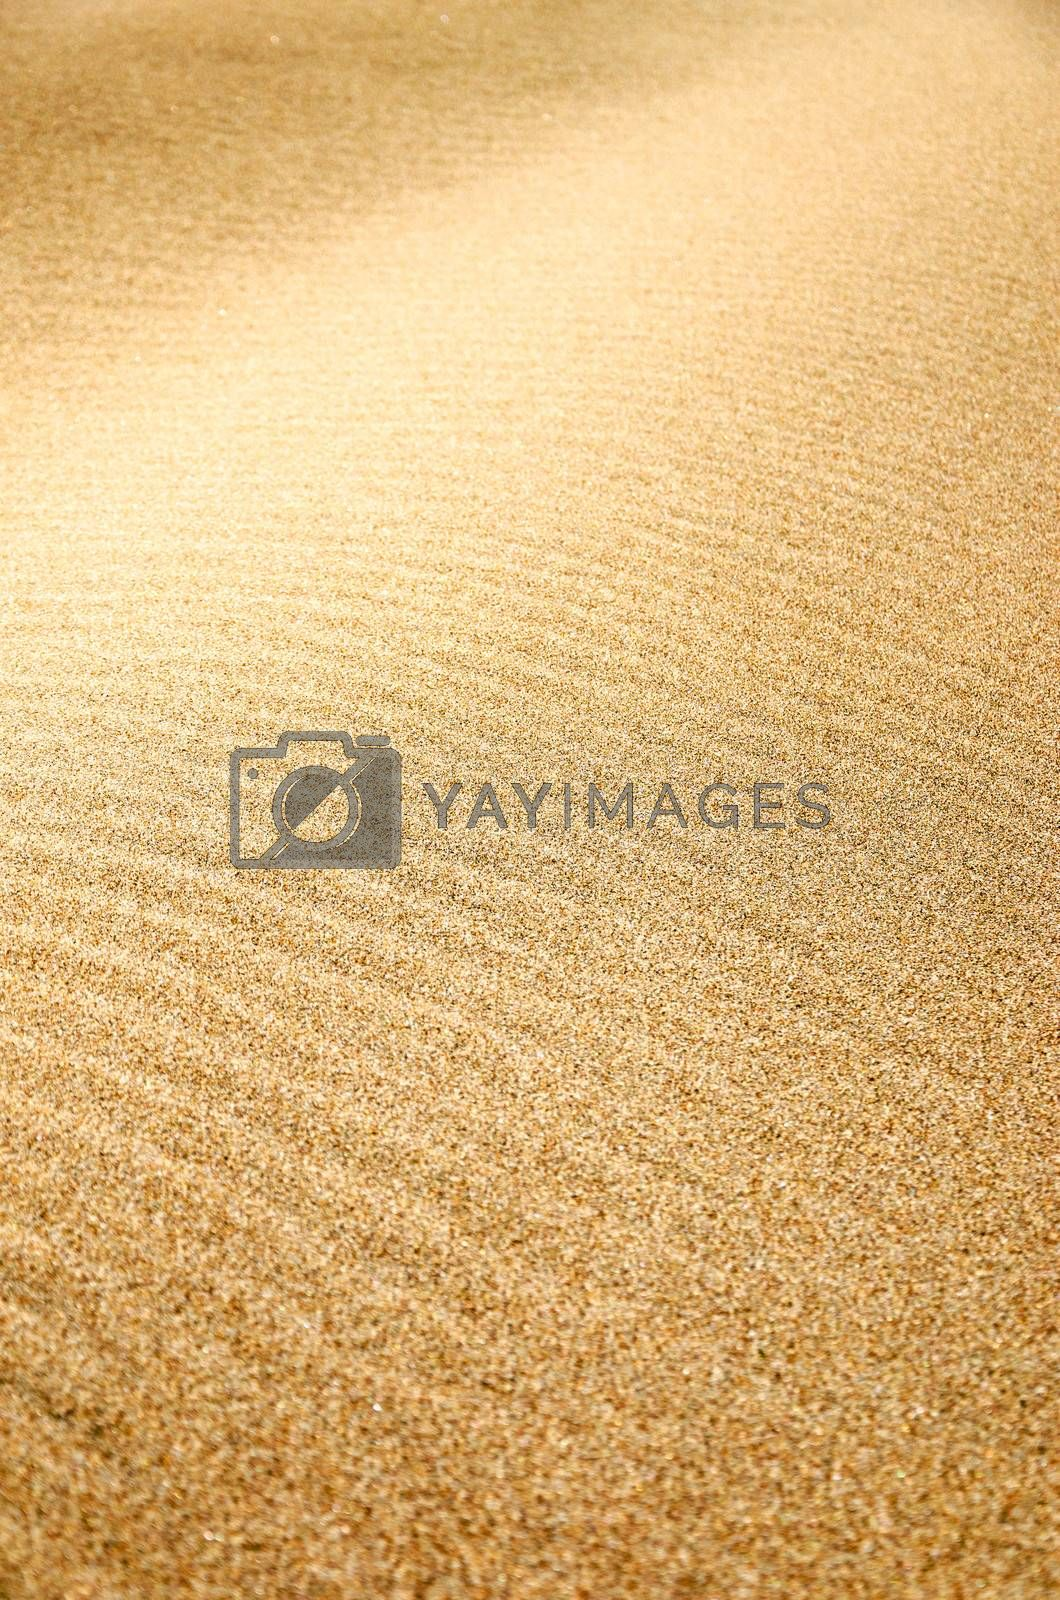 Sand texture on a beach in Oregon